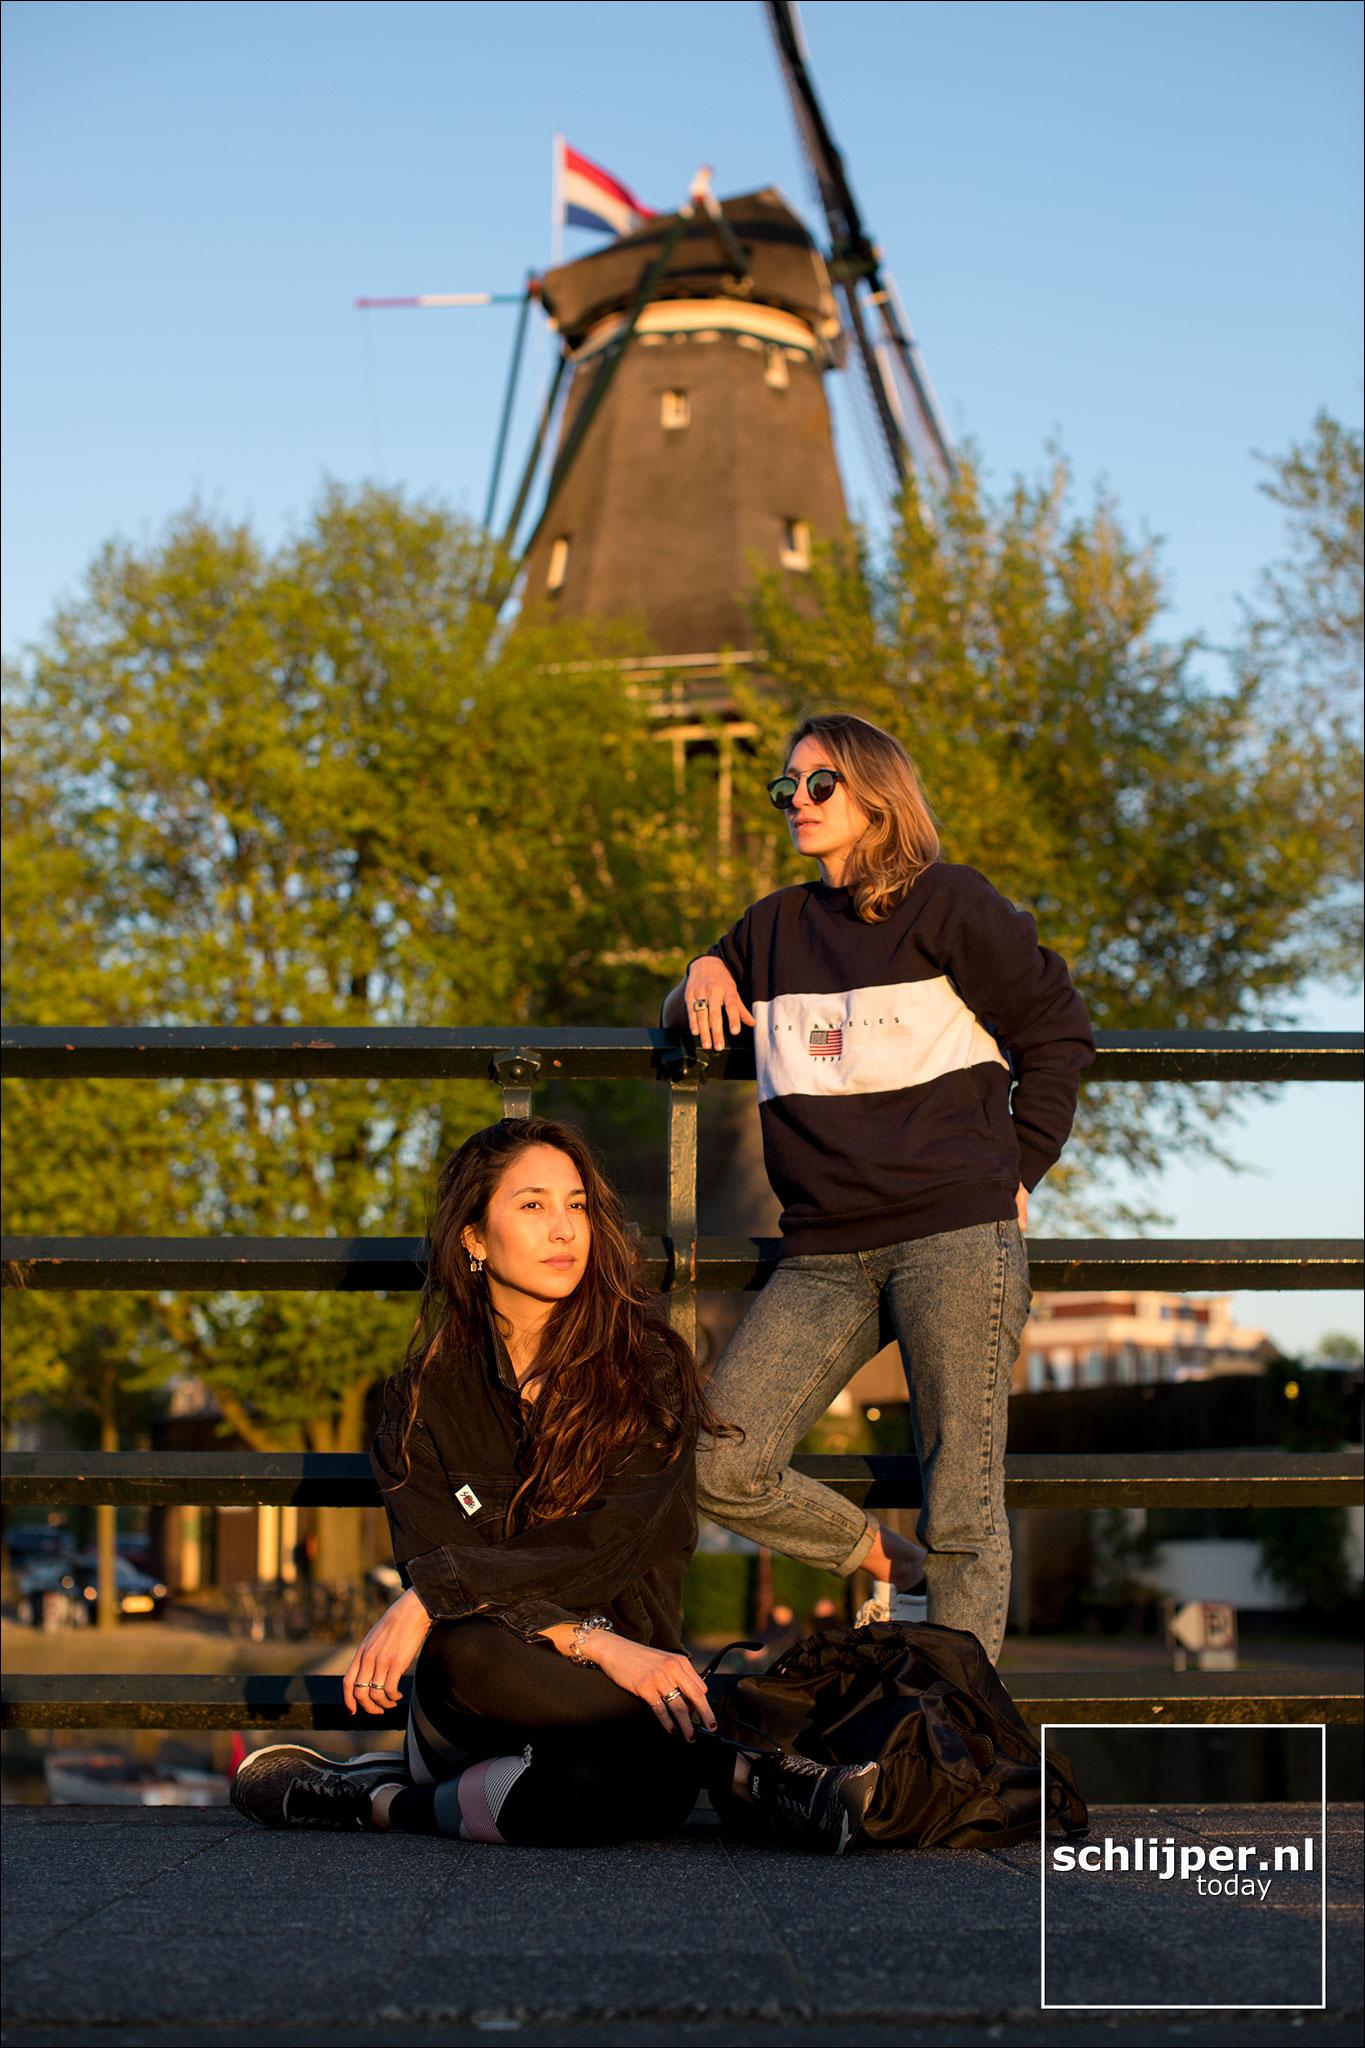 Nederland, Amsterdam, 5 mei 2018